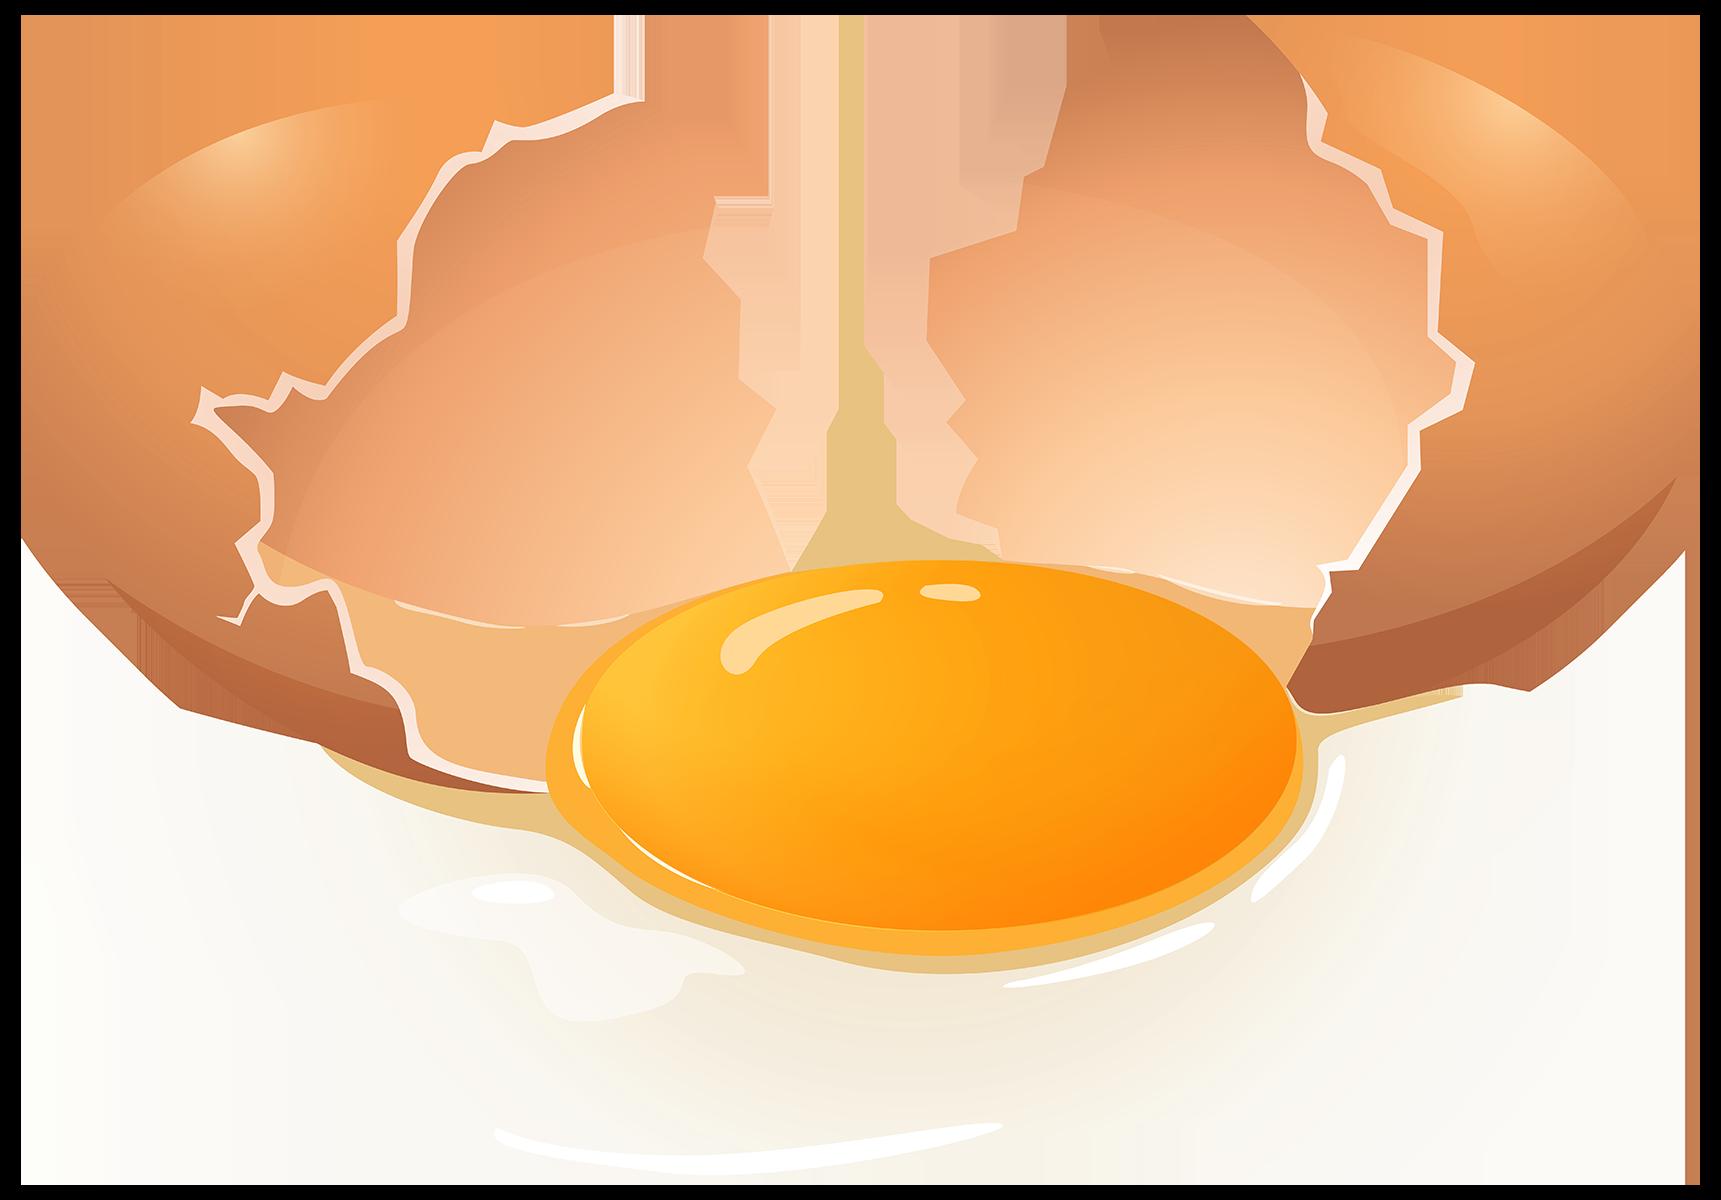 Разбитое яйцо - яйца, кулинария